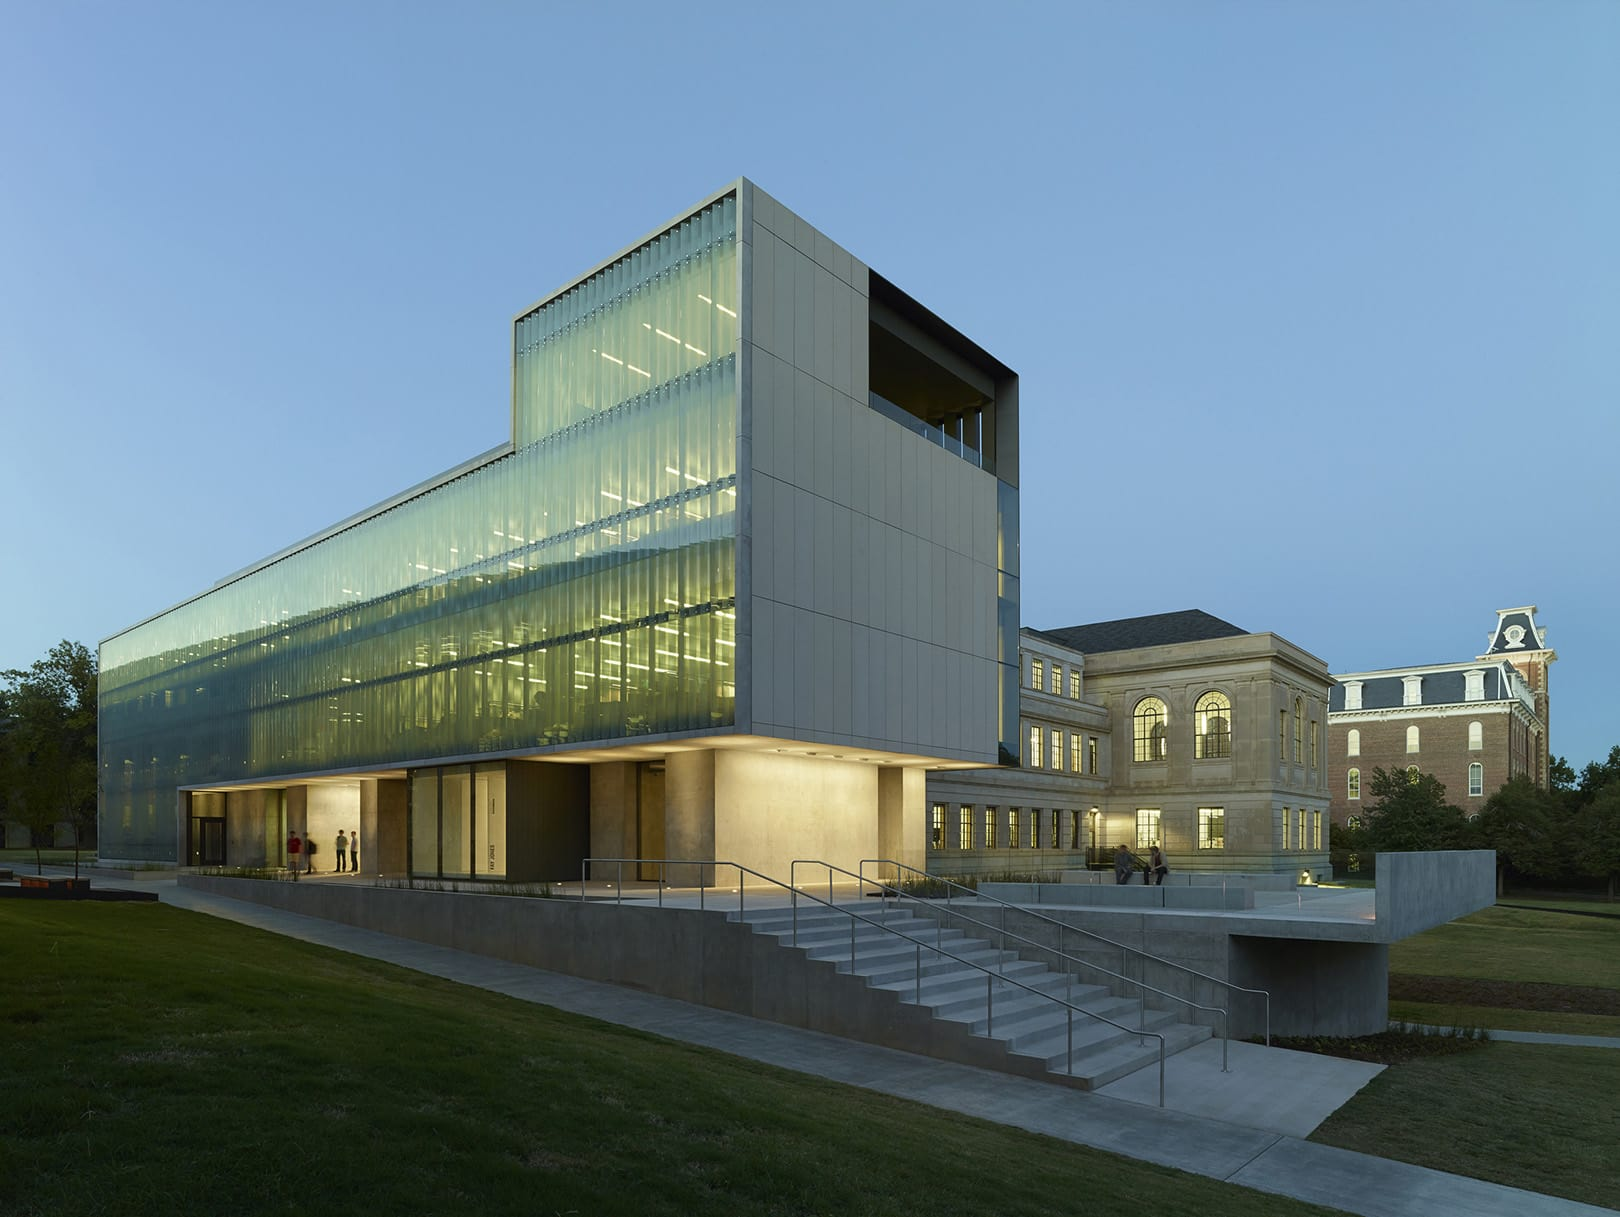 Vol Walker Hall & the Steven L Anderson Design Center